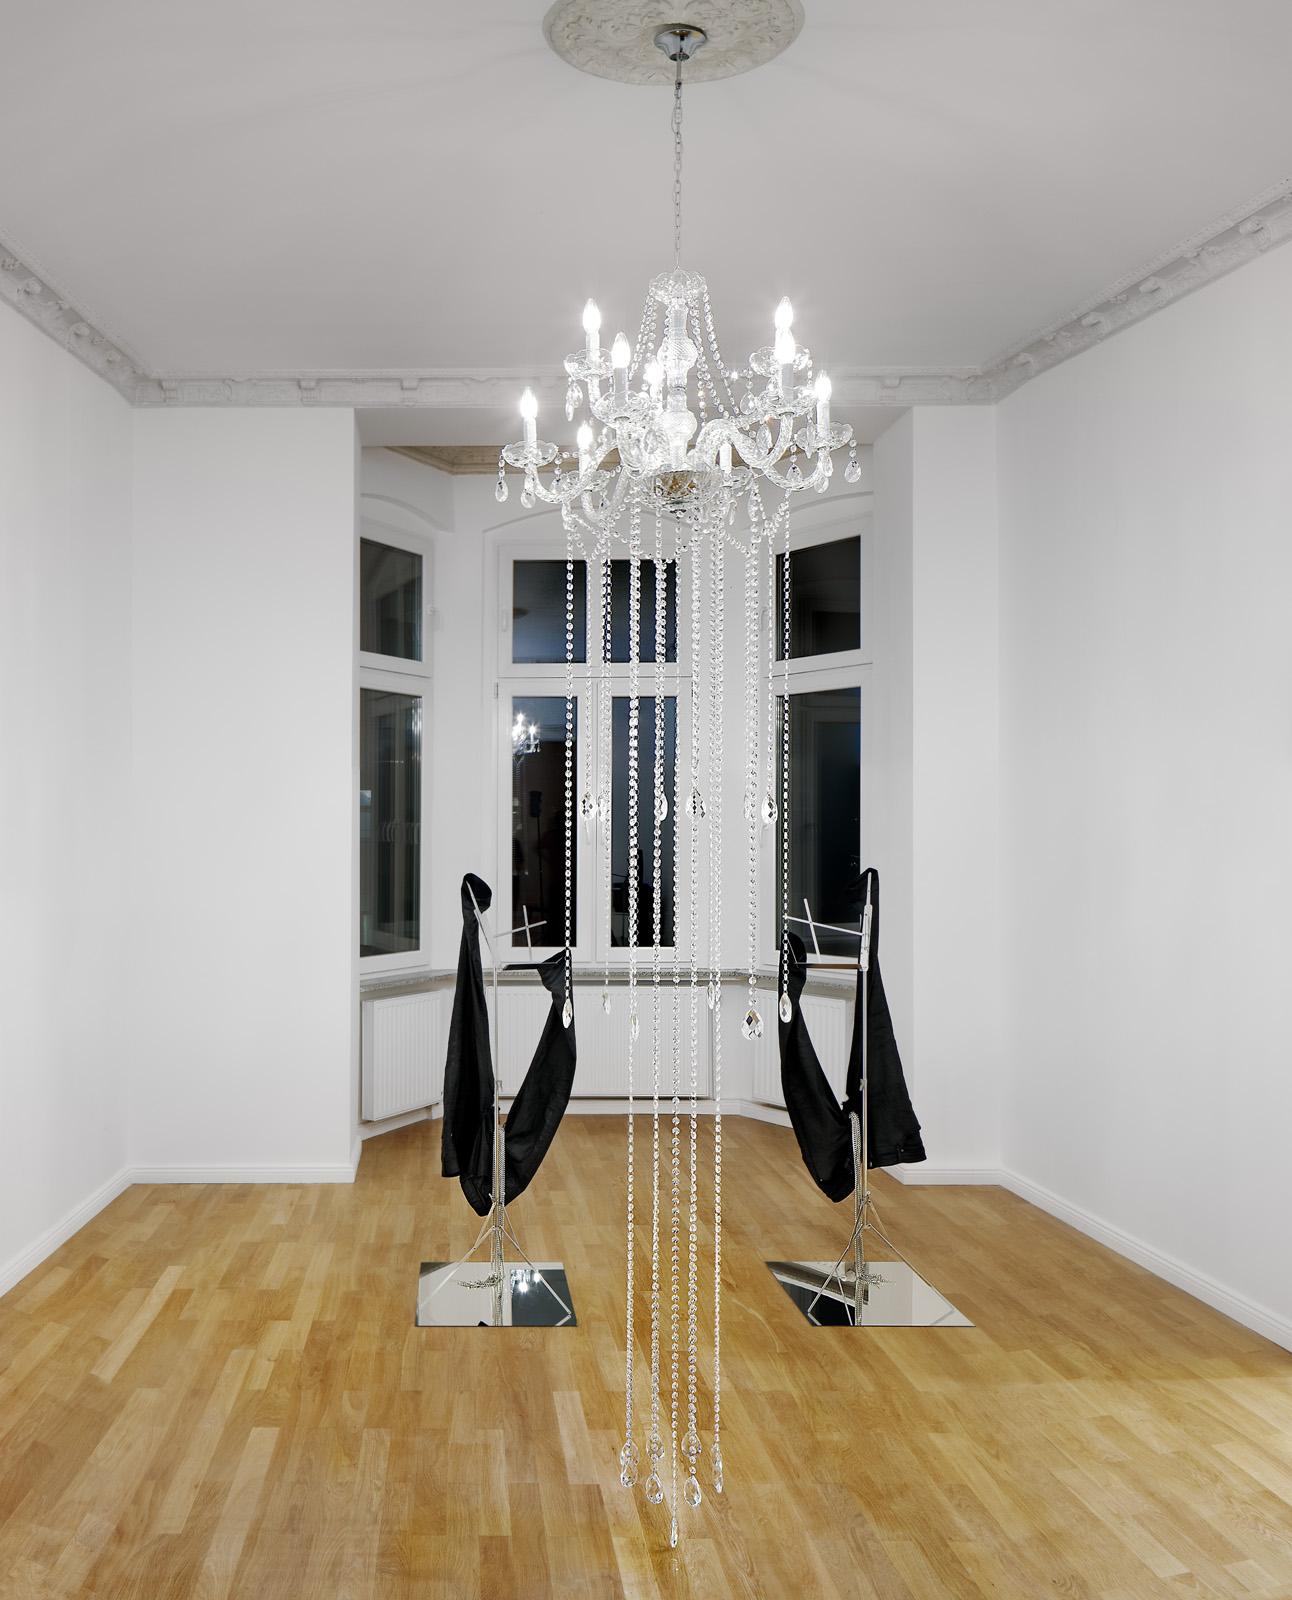 Installation view, Kayode Ojo,  Closer  Left to Right:  Kravitz, Stockholm (ZARA) , 2018;  He Valued His Privacy , 2018;  Kravitz, Stockholm (ASOS) , 2018